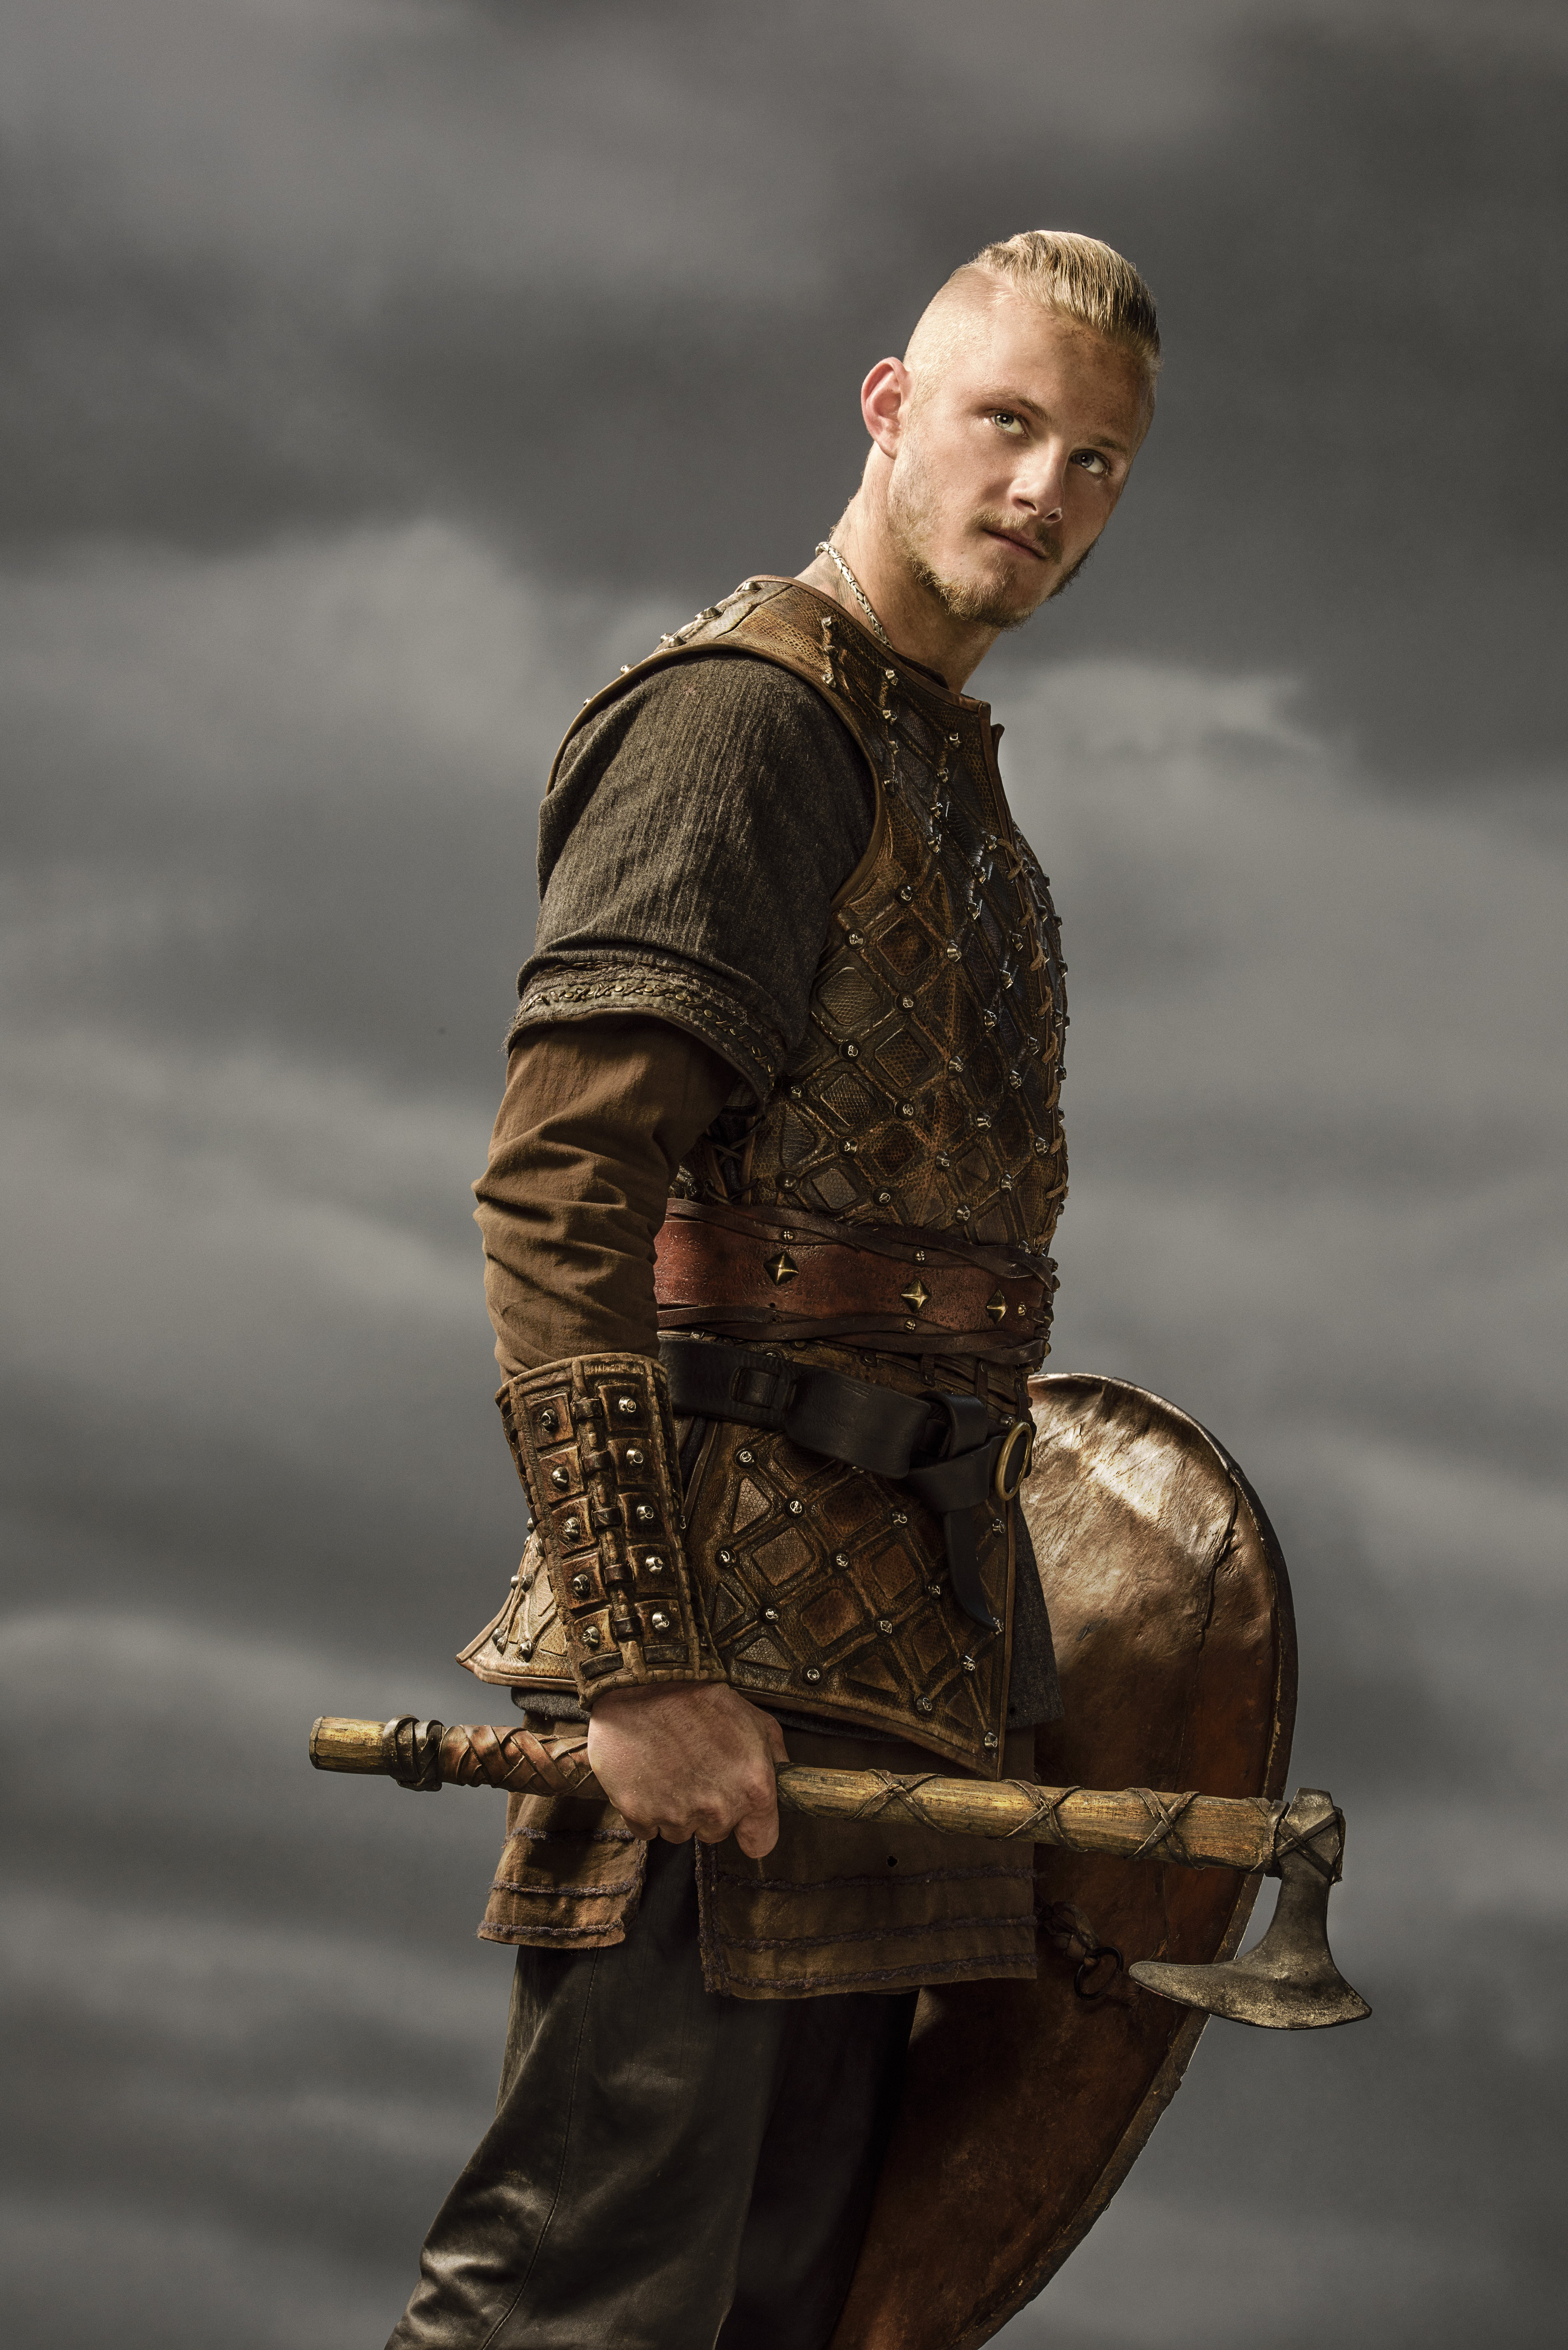 Bjorn Vikings Bjorn Ironside, Ragnar...